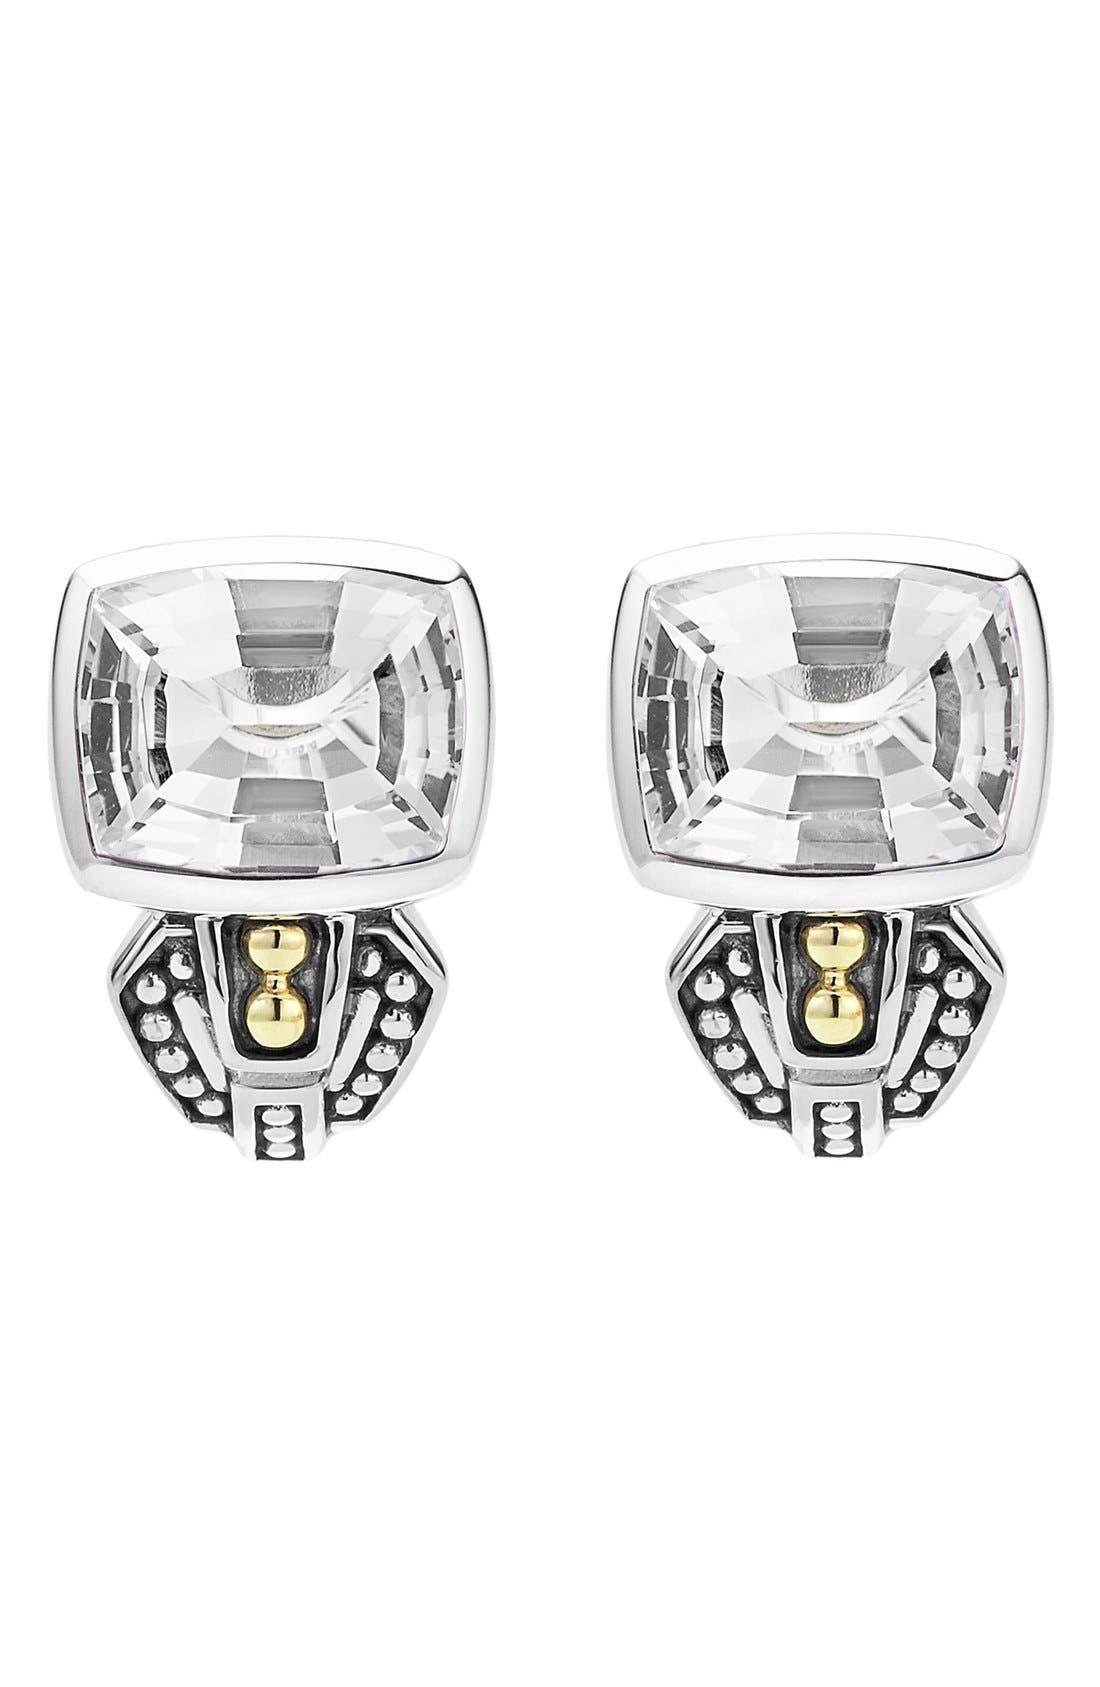 'Caviar Color' Semiprecious Stone Stud Earrings,                             Alternate thumbnail 2, color,                             WHITE TOPAZ